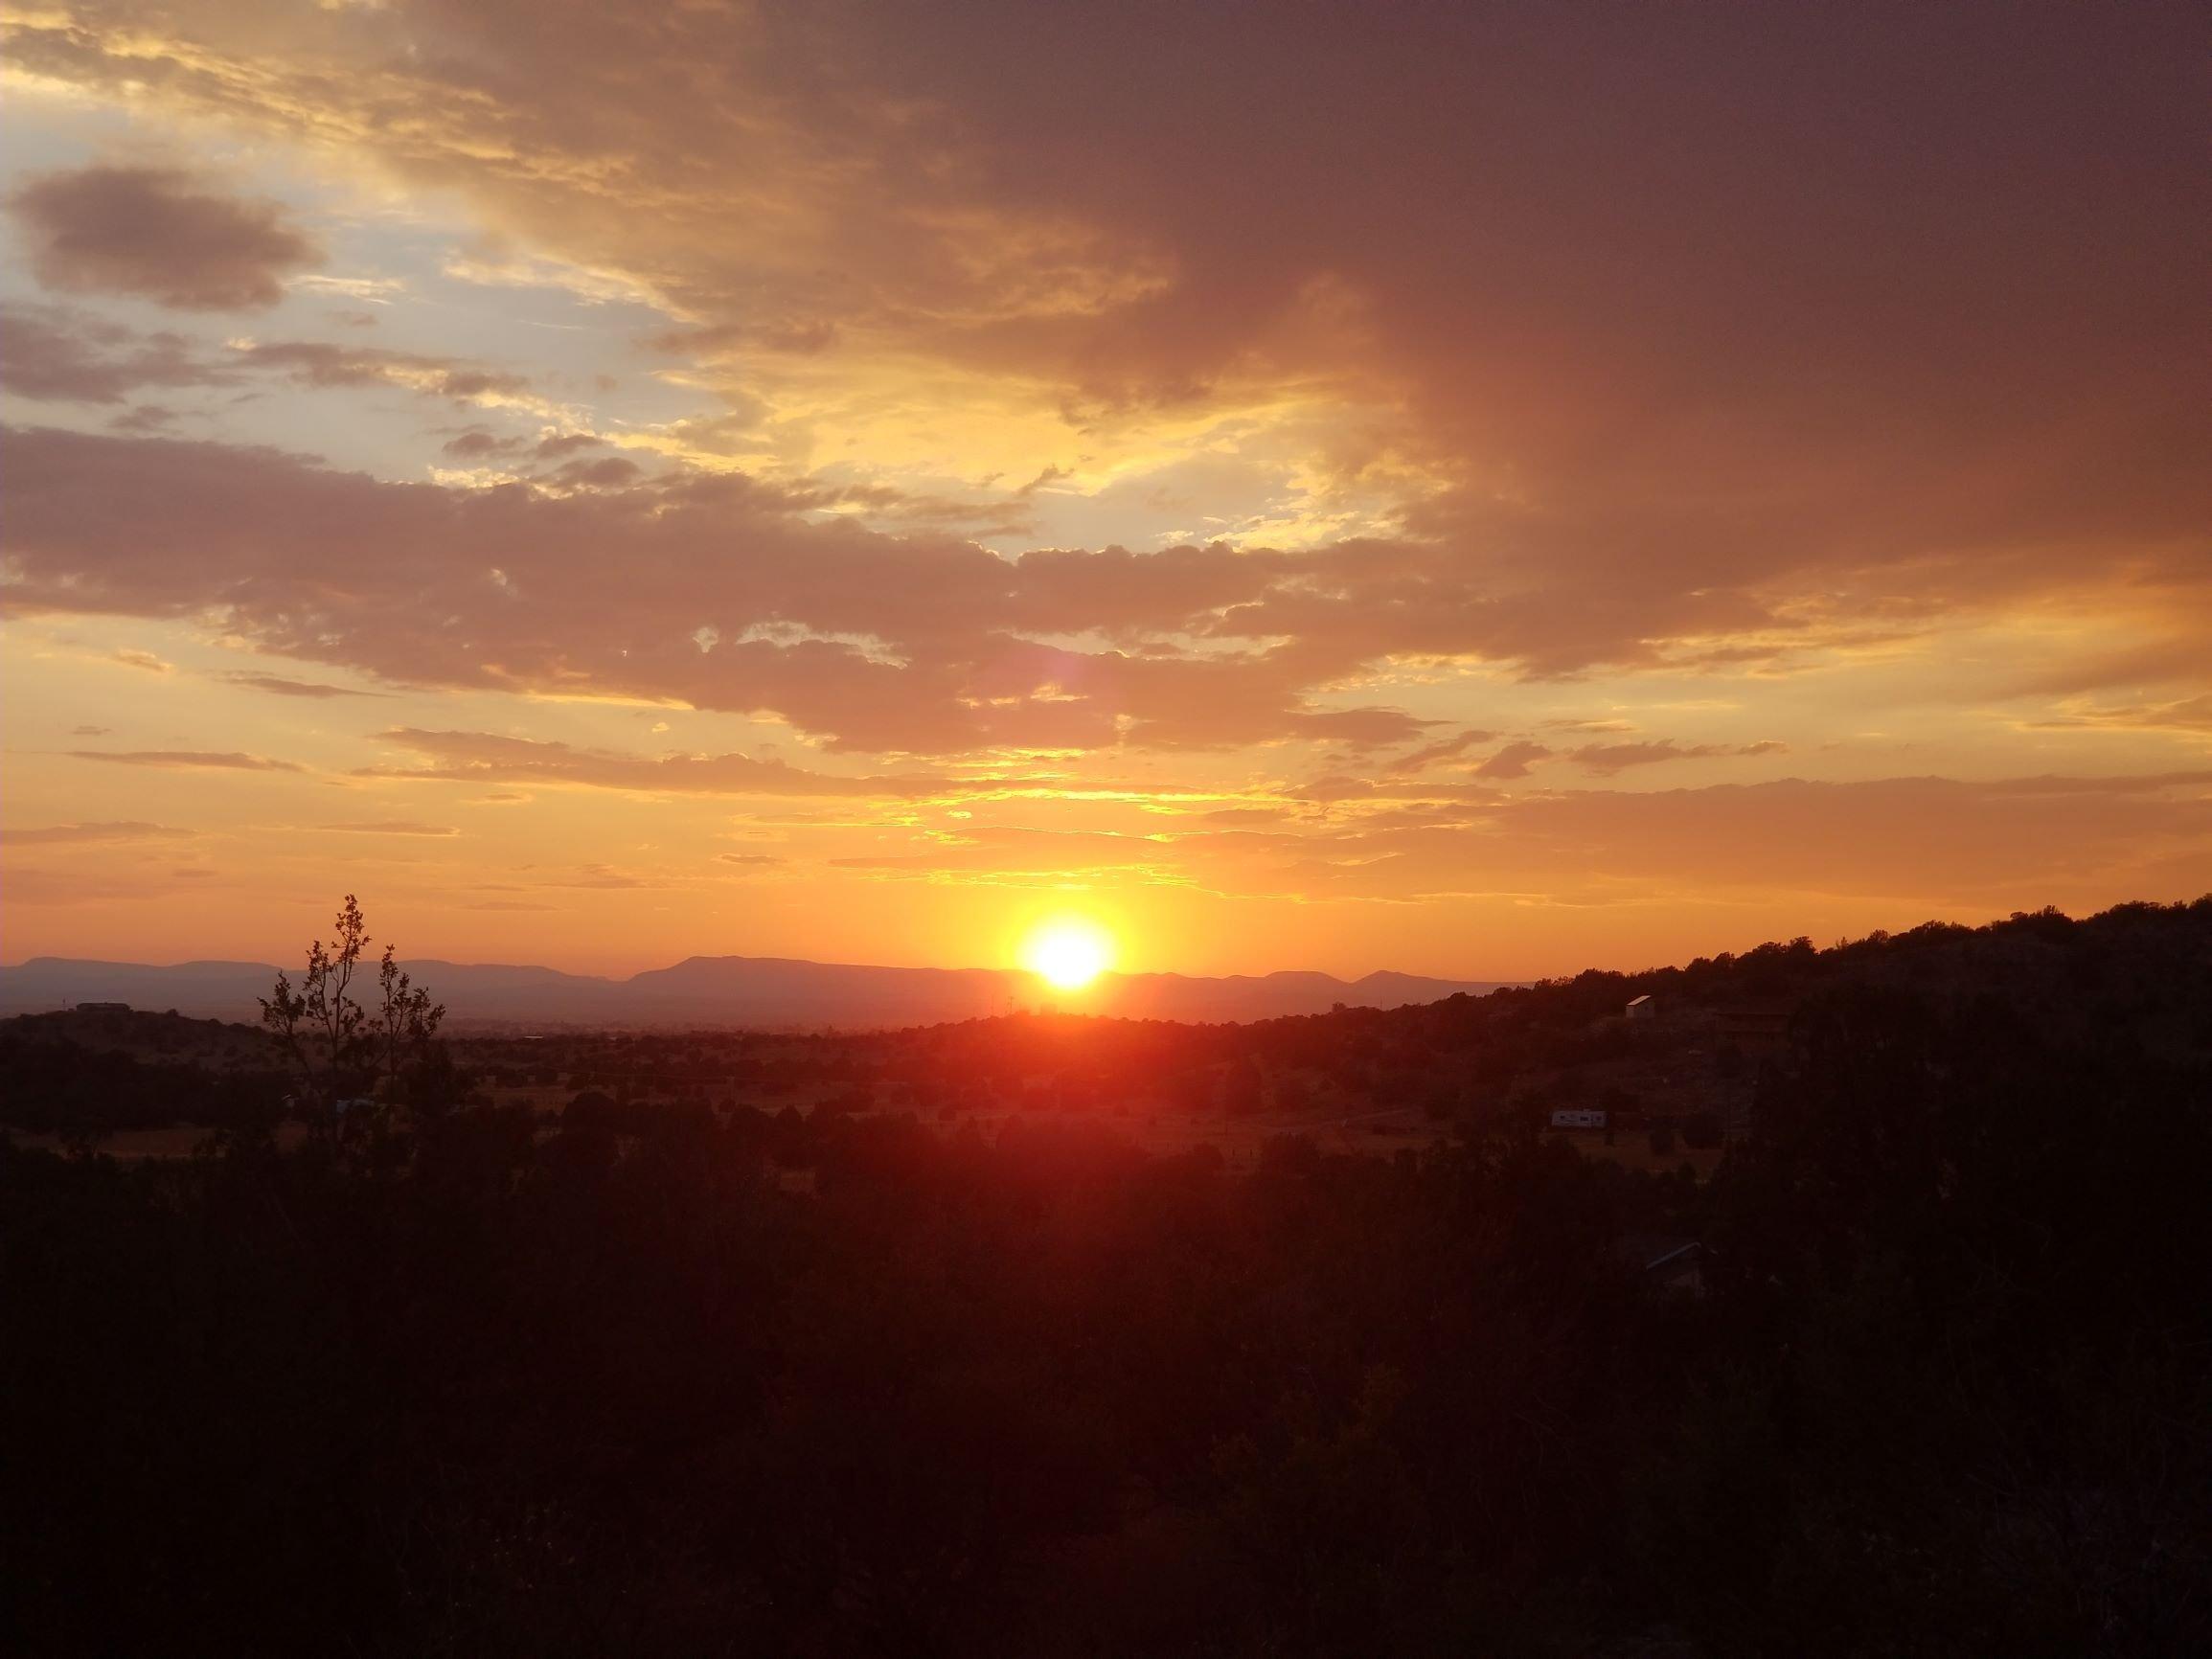 sunset 4mp.jpg